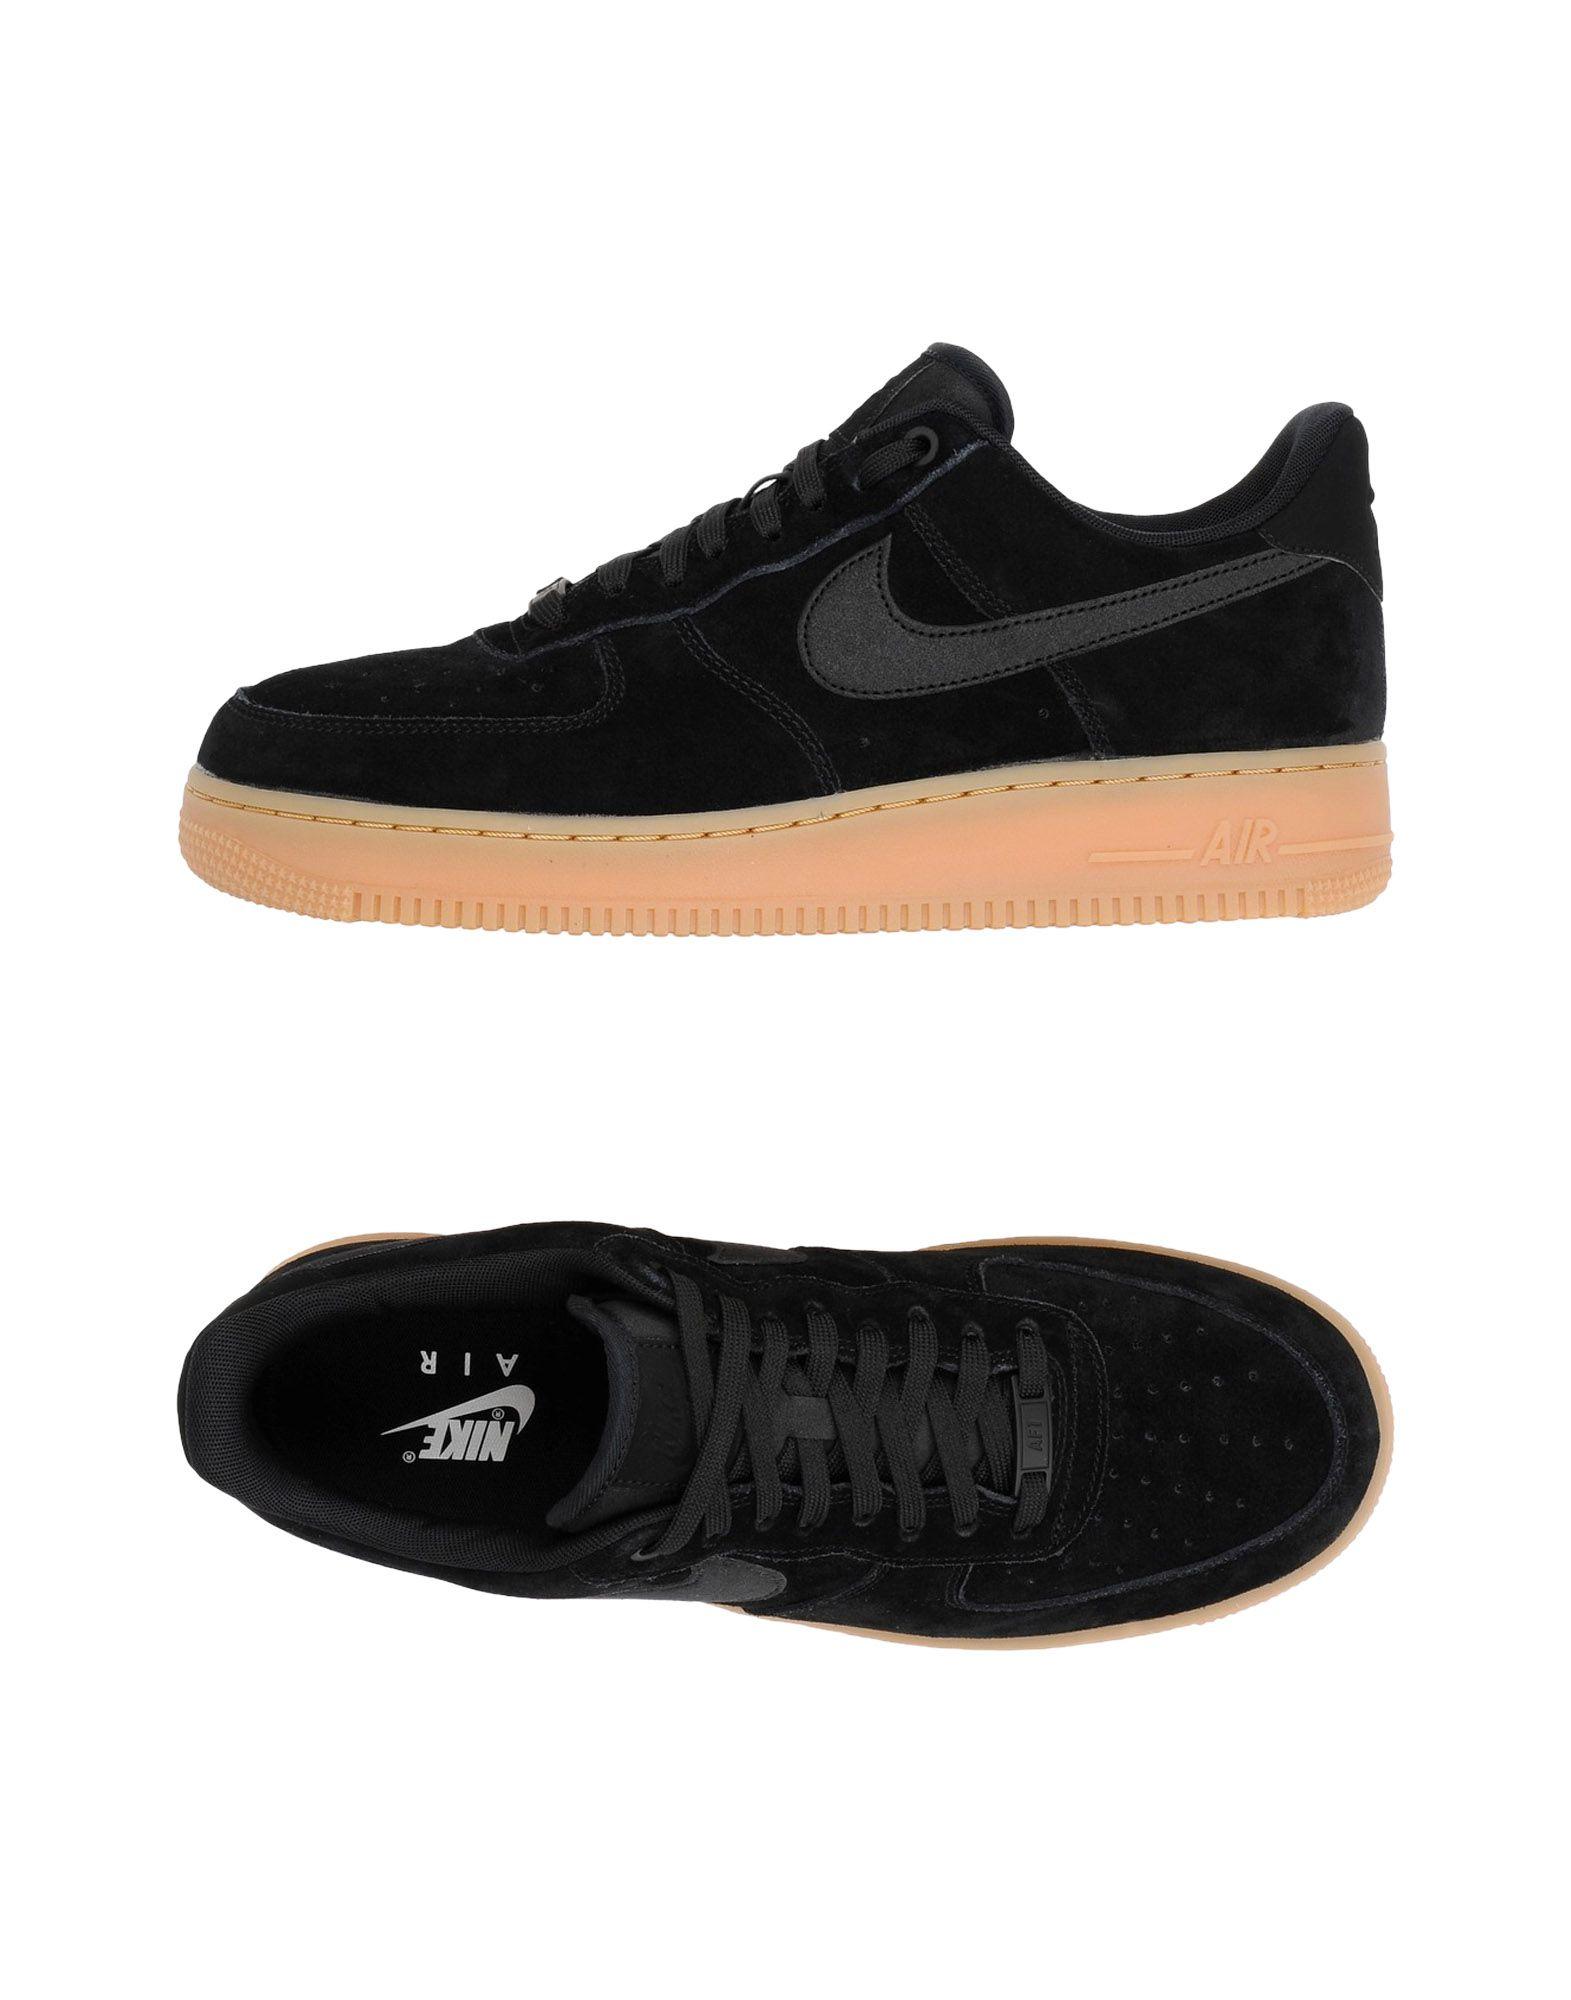 Sneakers Nike Air Force 1 '07 Lv8 Suede - Uomo - 11375064ME